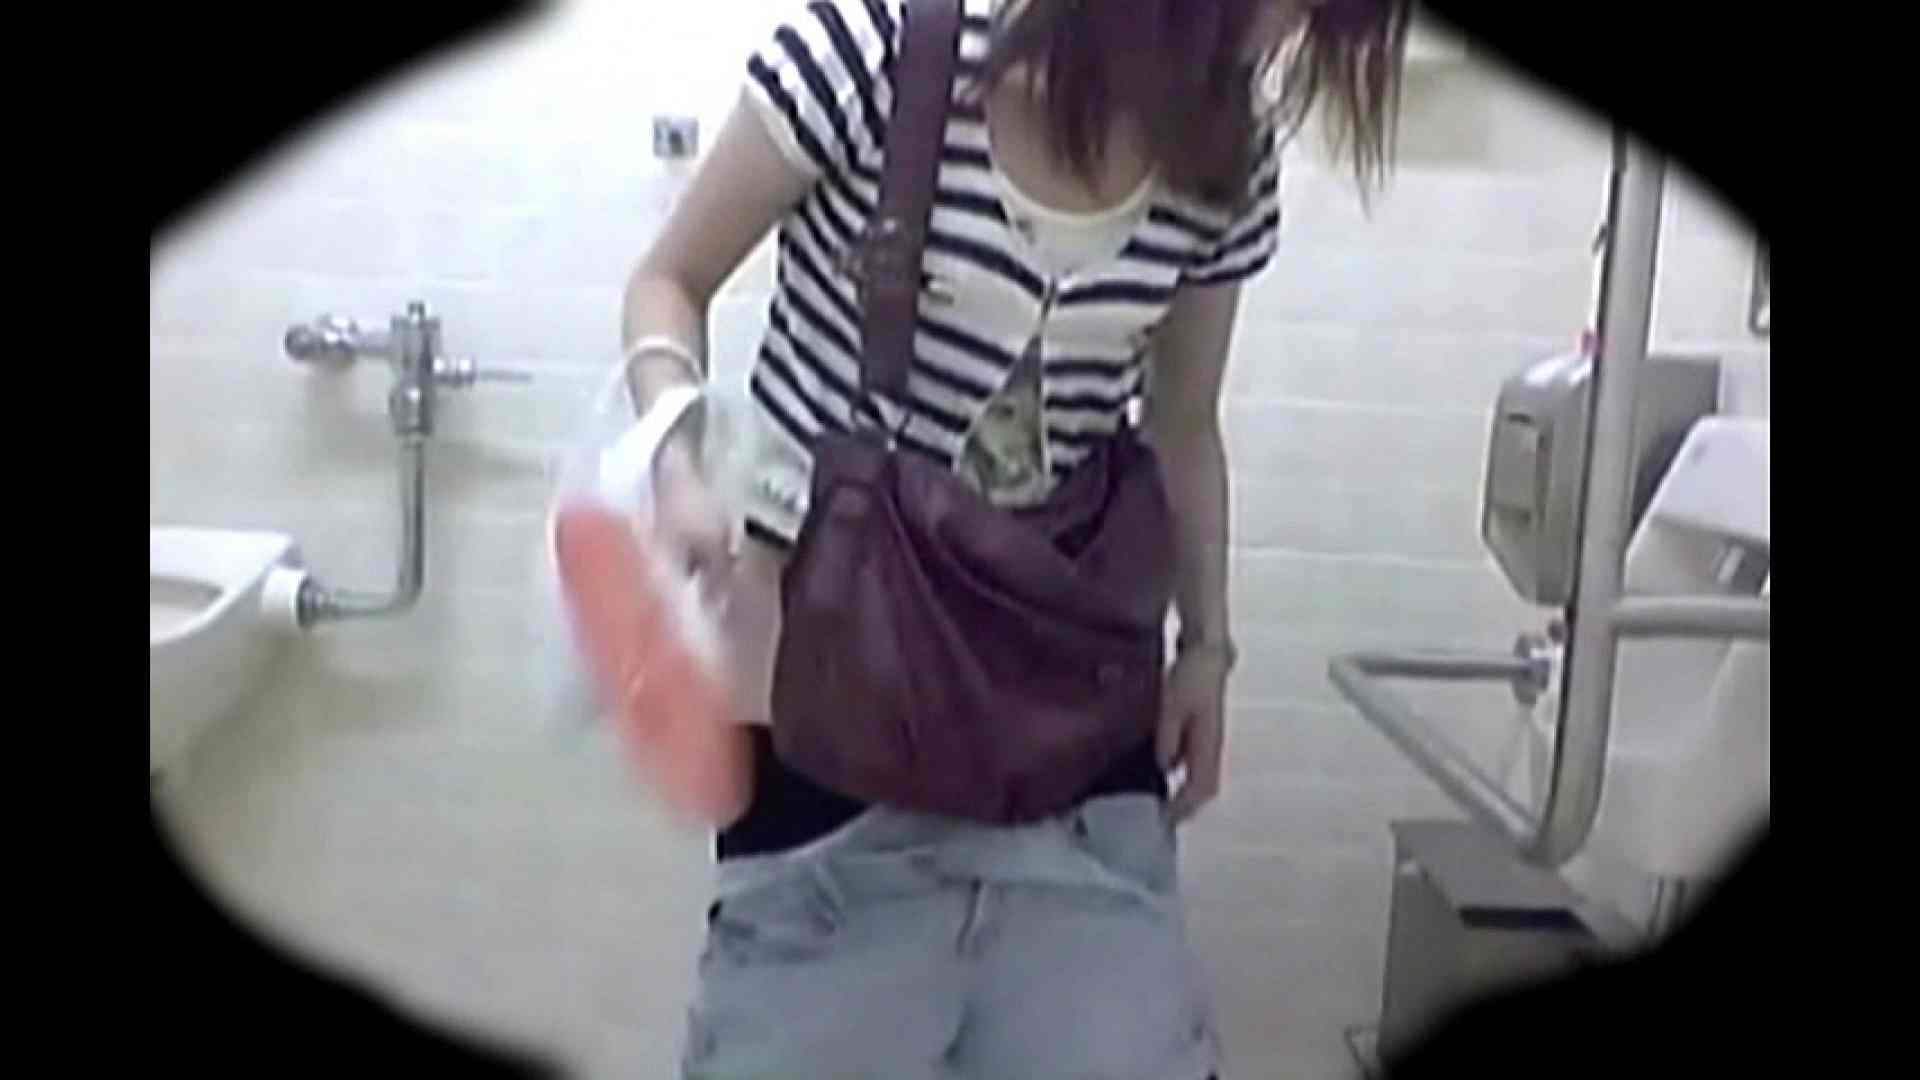 teen galトイレ覗き紙がナイ編‼vol.06 覗き スケベ動画紹介 82連発 62